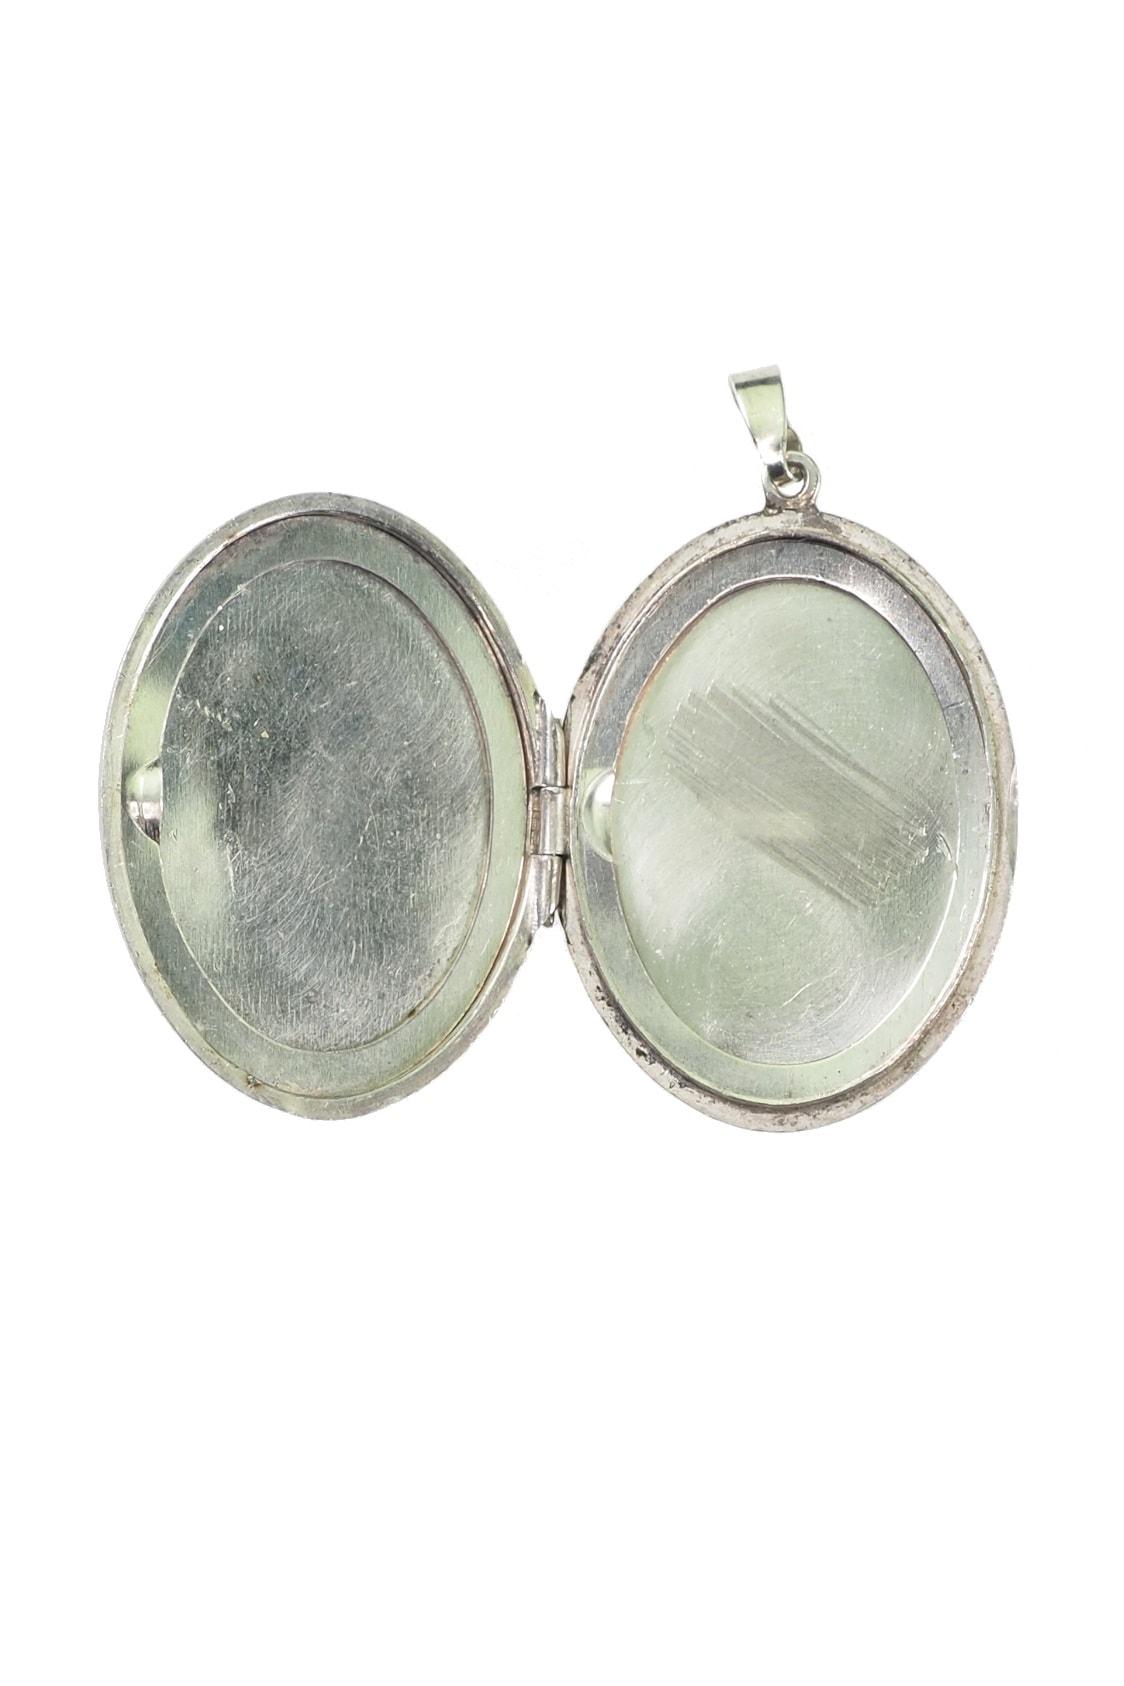 antiken-Silberschmuck-kaufen-2331b